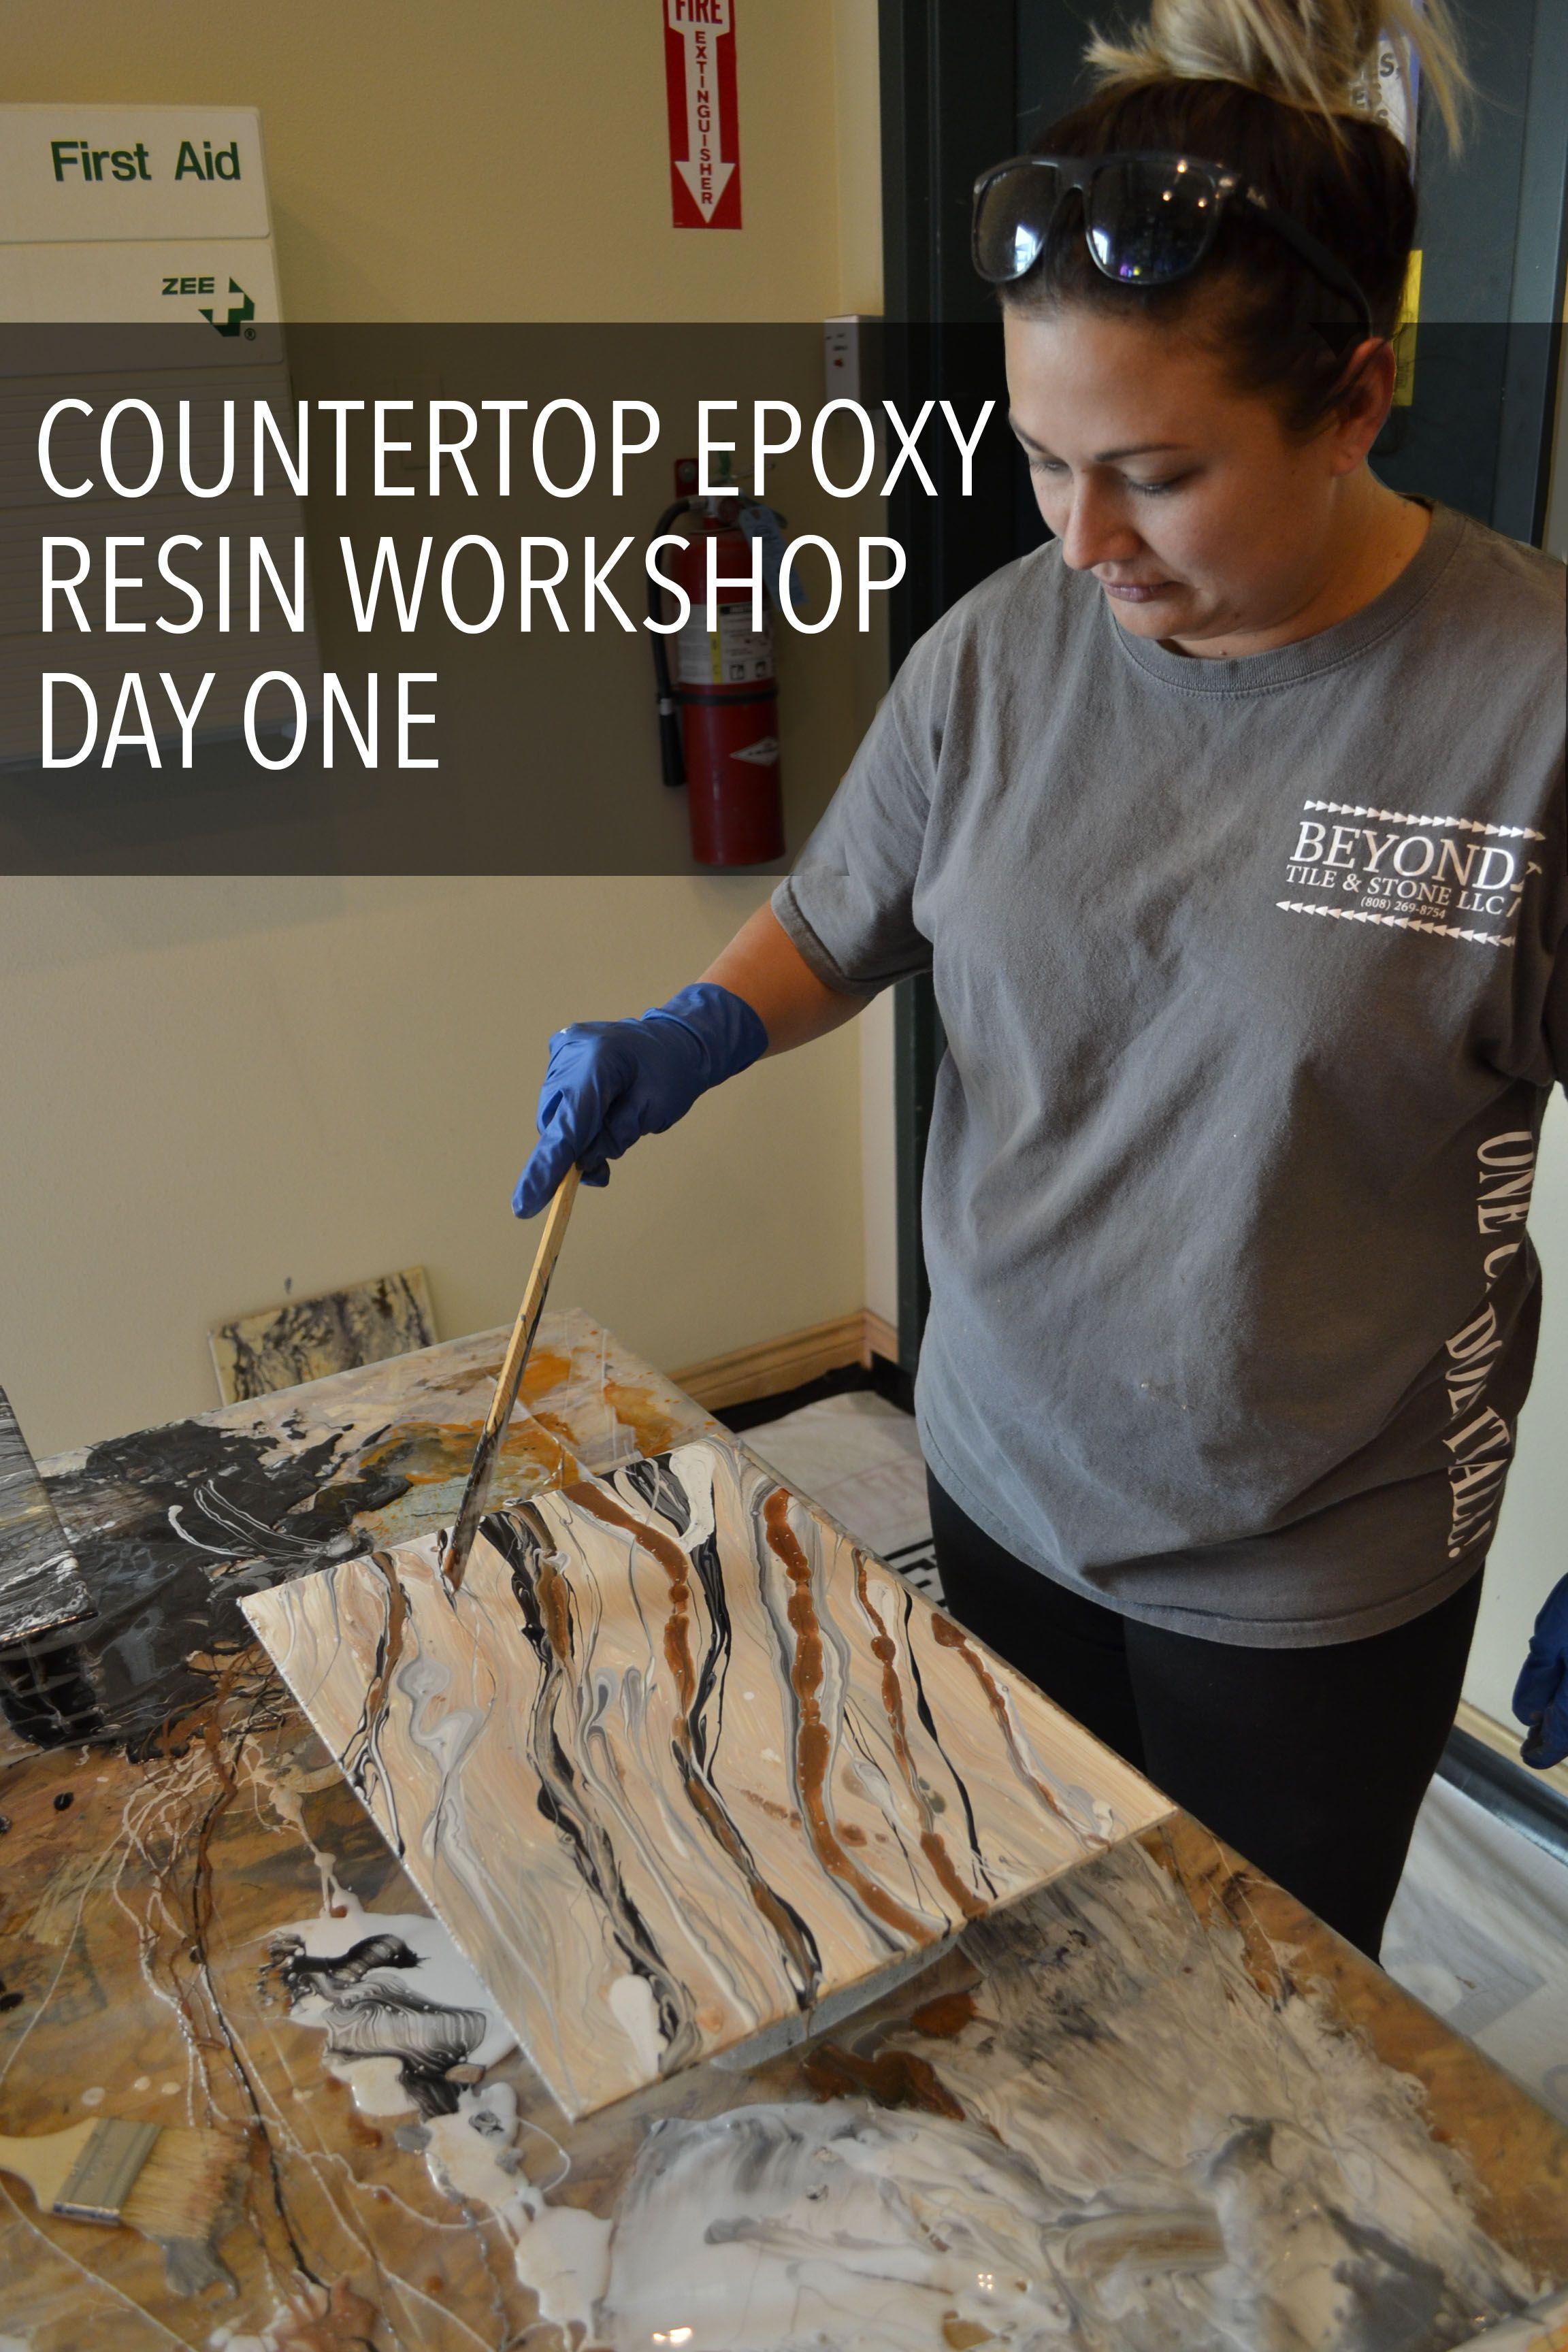 Countertop Epoxy Resin Workshop October 2017 Epoxy Countertop Resin Countertops Epoxy Resin